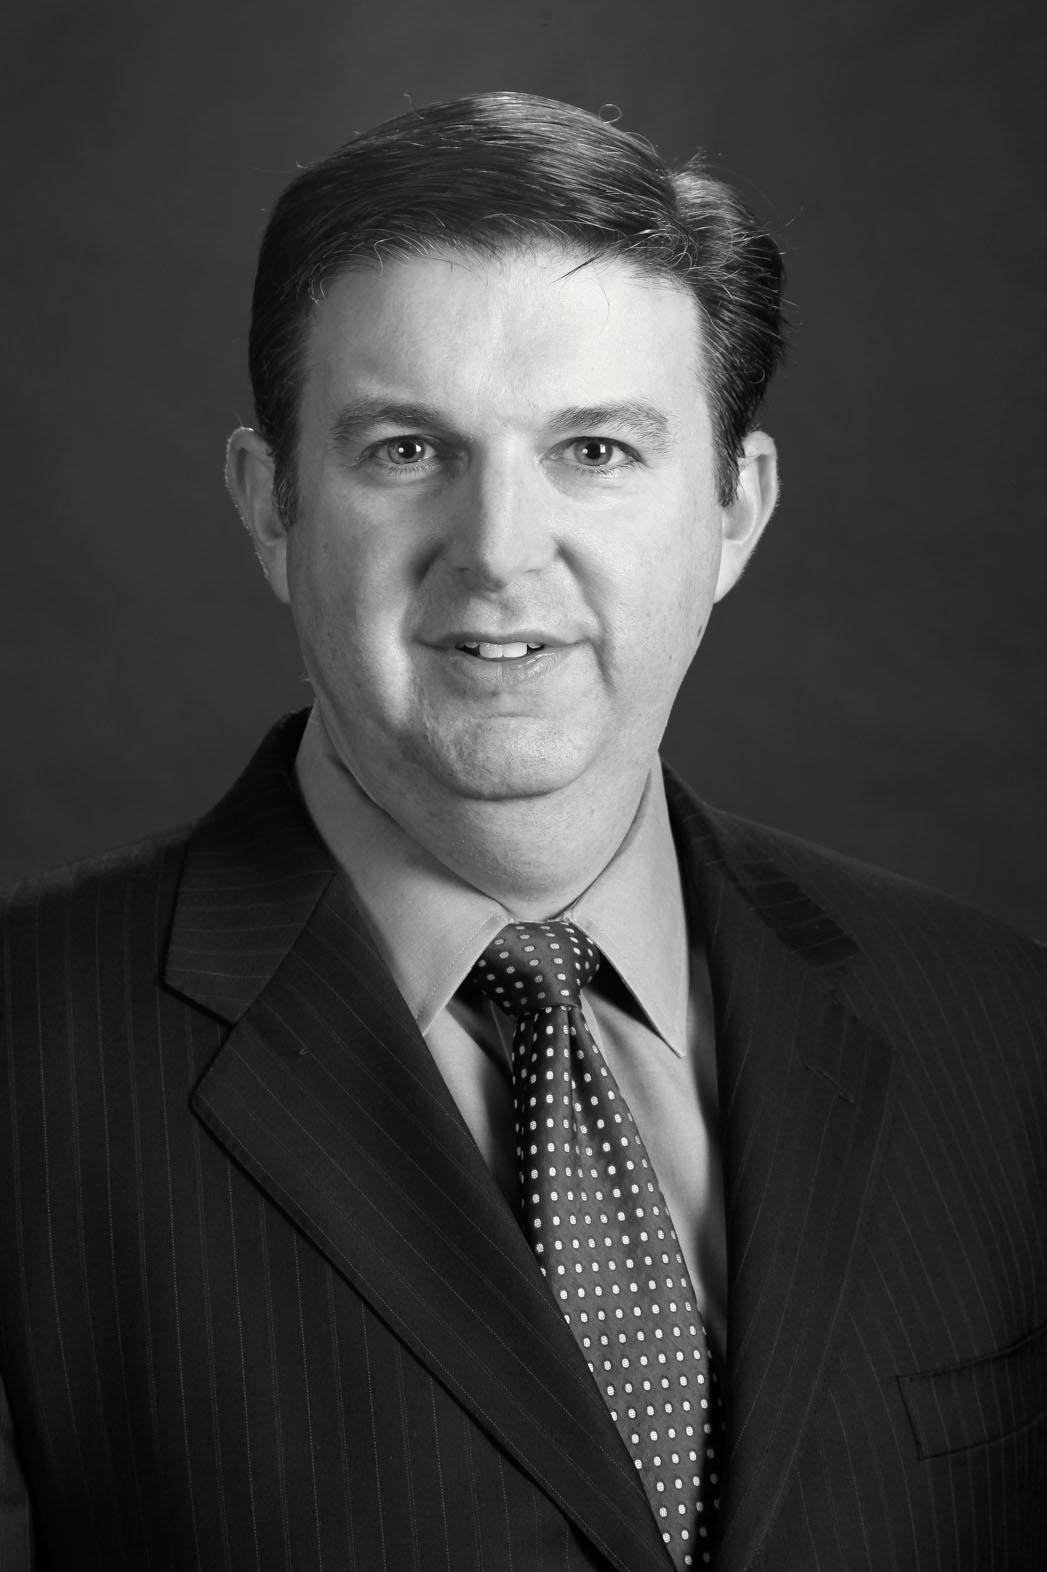 Richard Greenfield Headshot - P 2014